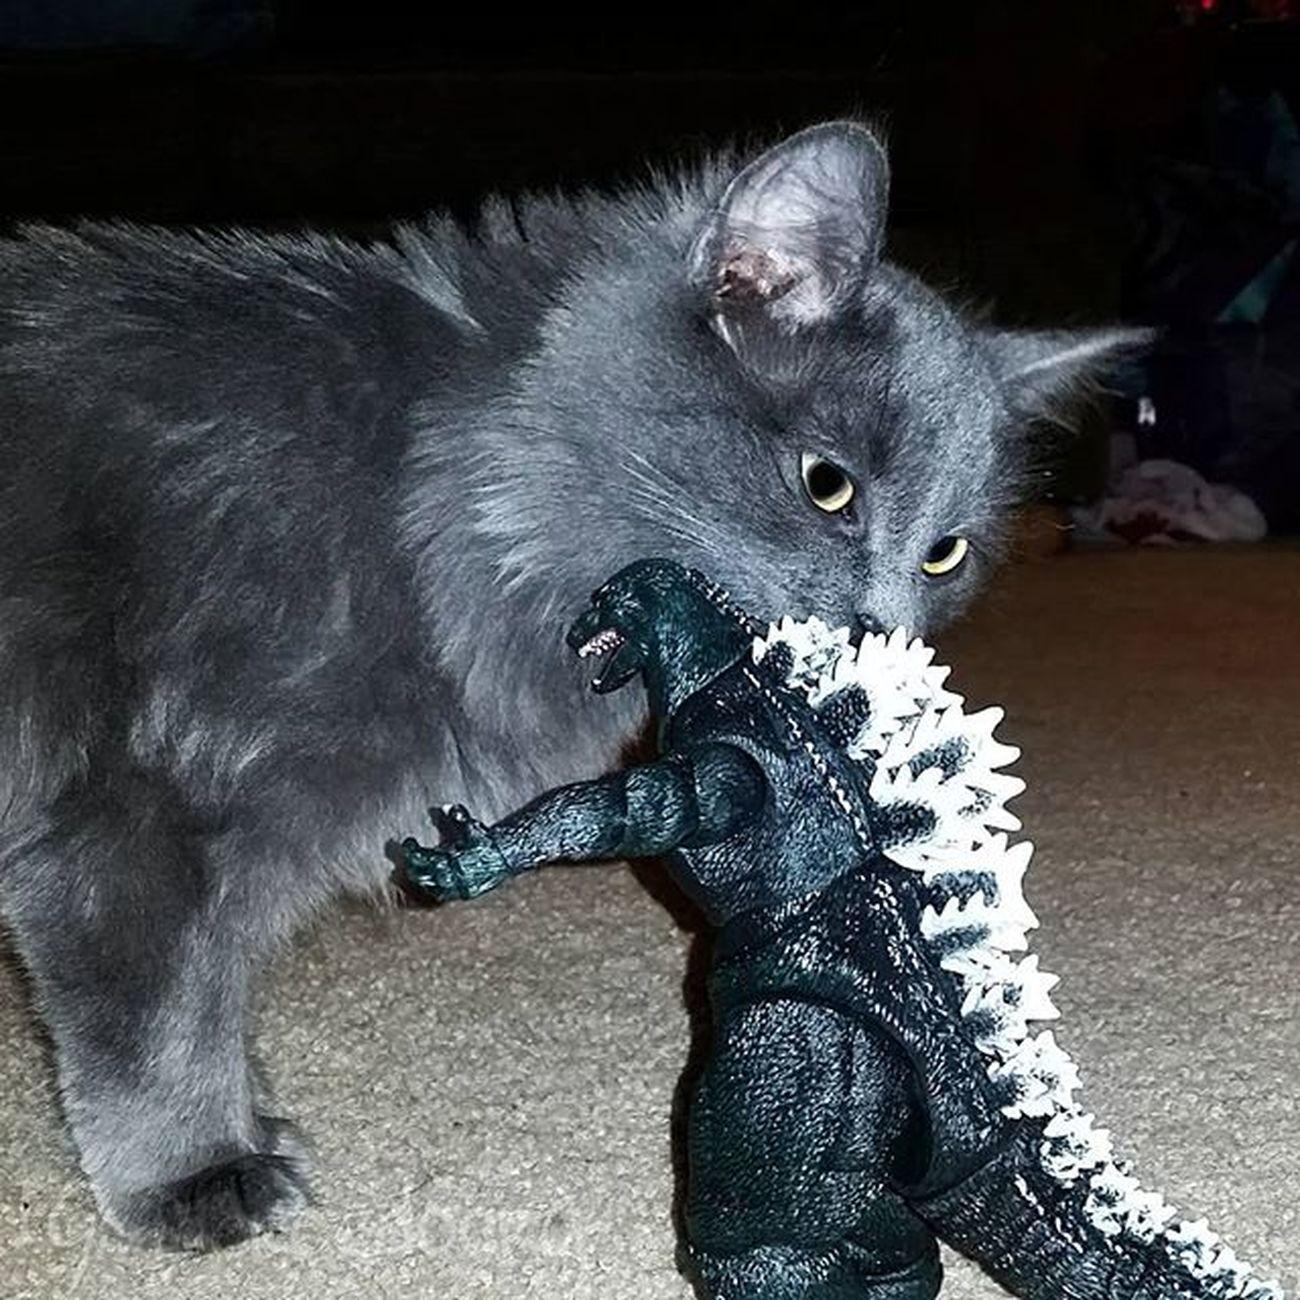 Godzilla vs Mega fluffy Tcb_megachomp Tcb_followruleslikeme Godzilla Instakitten Sofluffyimgonnadie Instacat